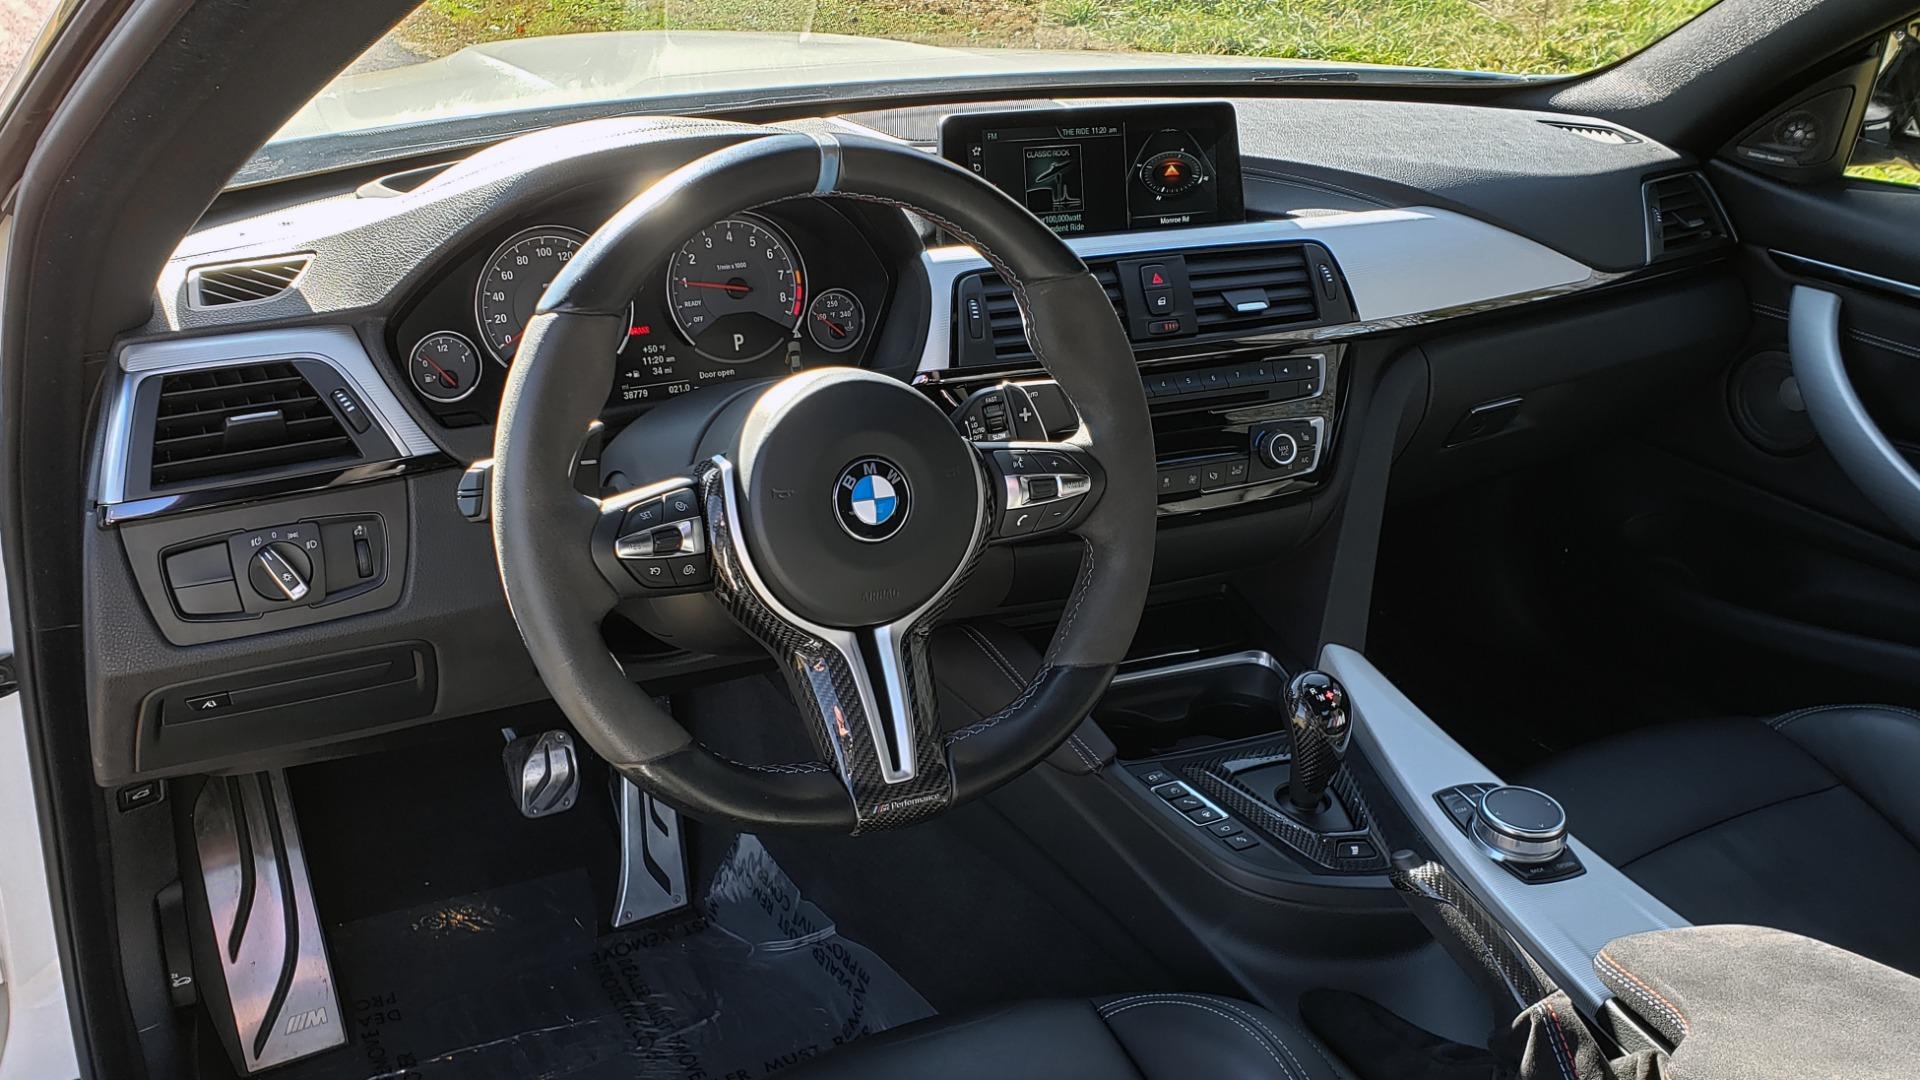 Used 2018 BMW M4 COMP PKG / EXEC / M-DRIVER / PARK CNTRL / ACTIVE BLIND SPOT for sale $45,449 at Formula Imports in Charlotte NC 28227 39